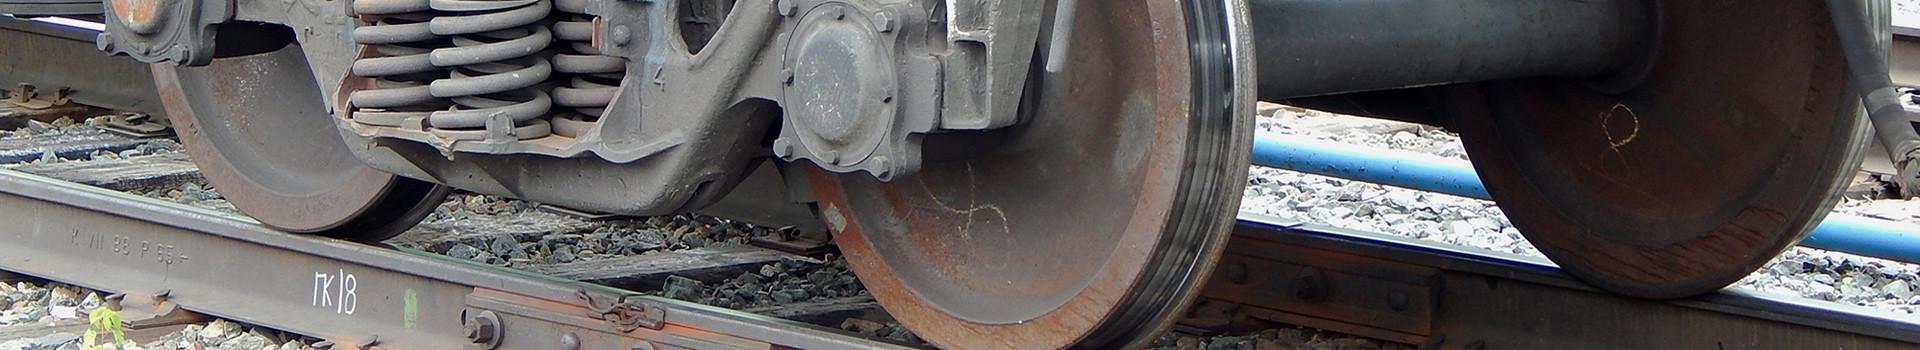 train on train tracks